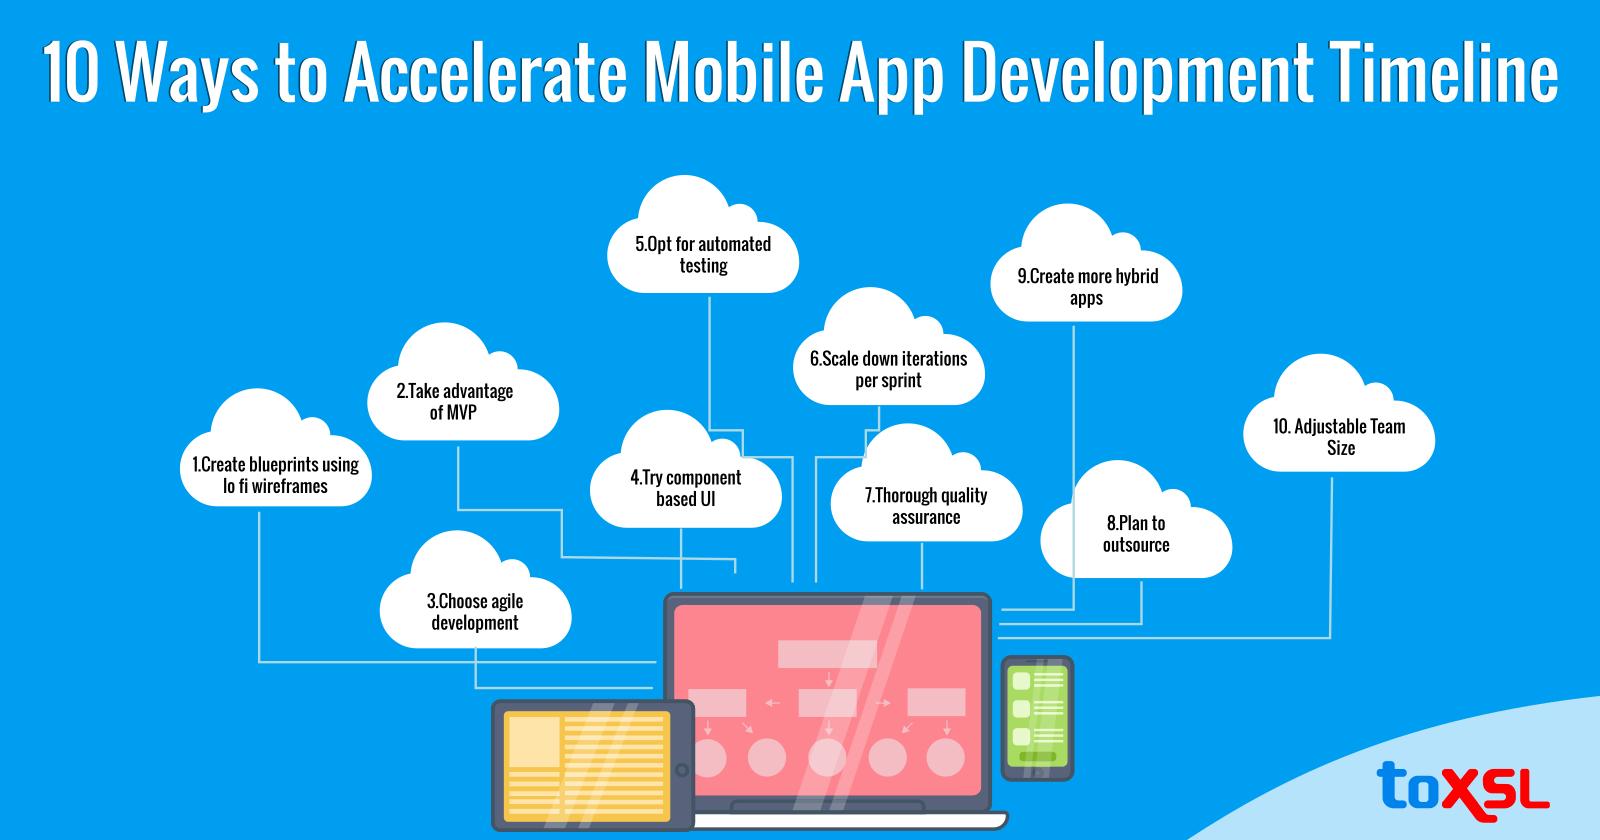 10 Ways to Accelerate Mobile App Development Timeline